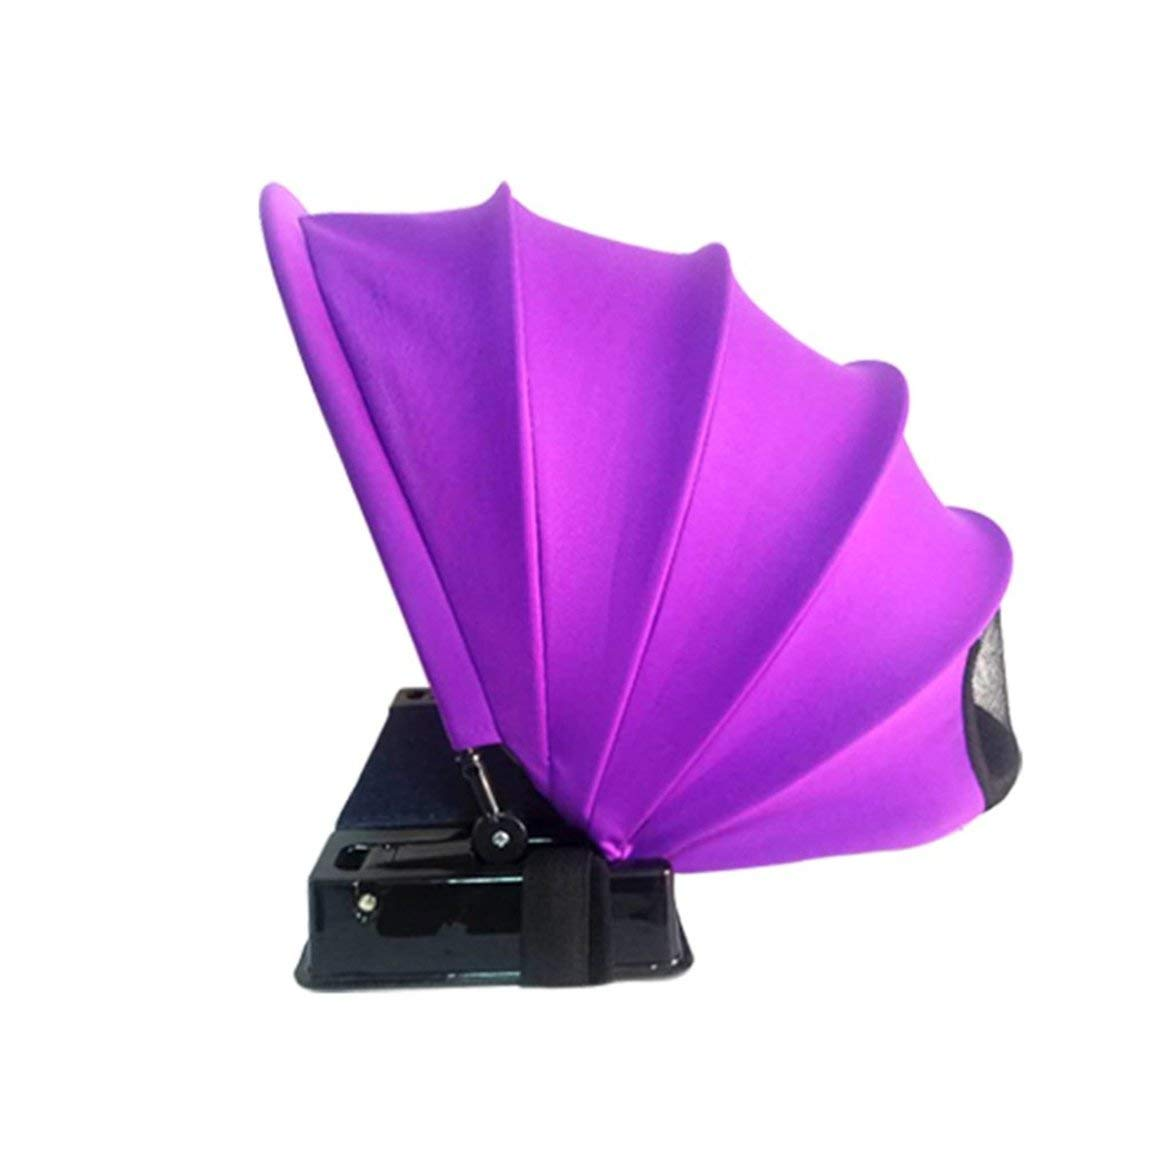 Fantasyworld Easy Pop Up Strand-Zelt Sun Shelter Zelt Sonnenschutz, Sonnenschutz wasserdicht Polyester Anti-UV-Strahlung Mini Fan